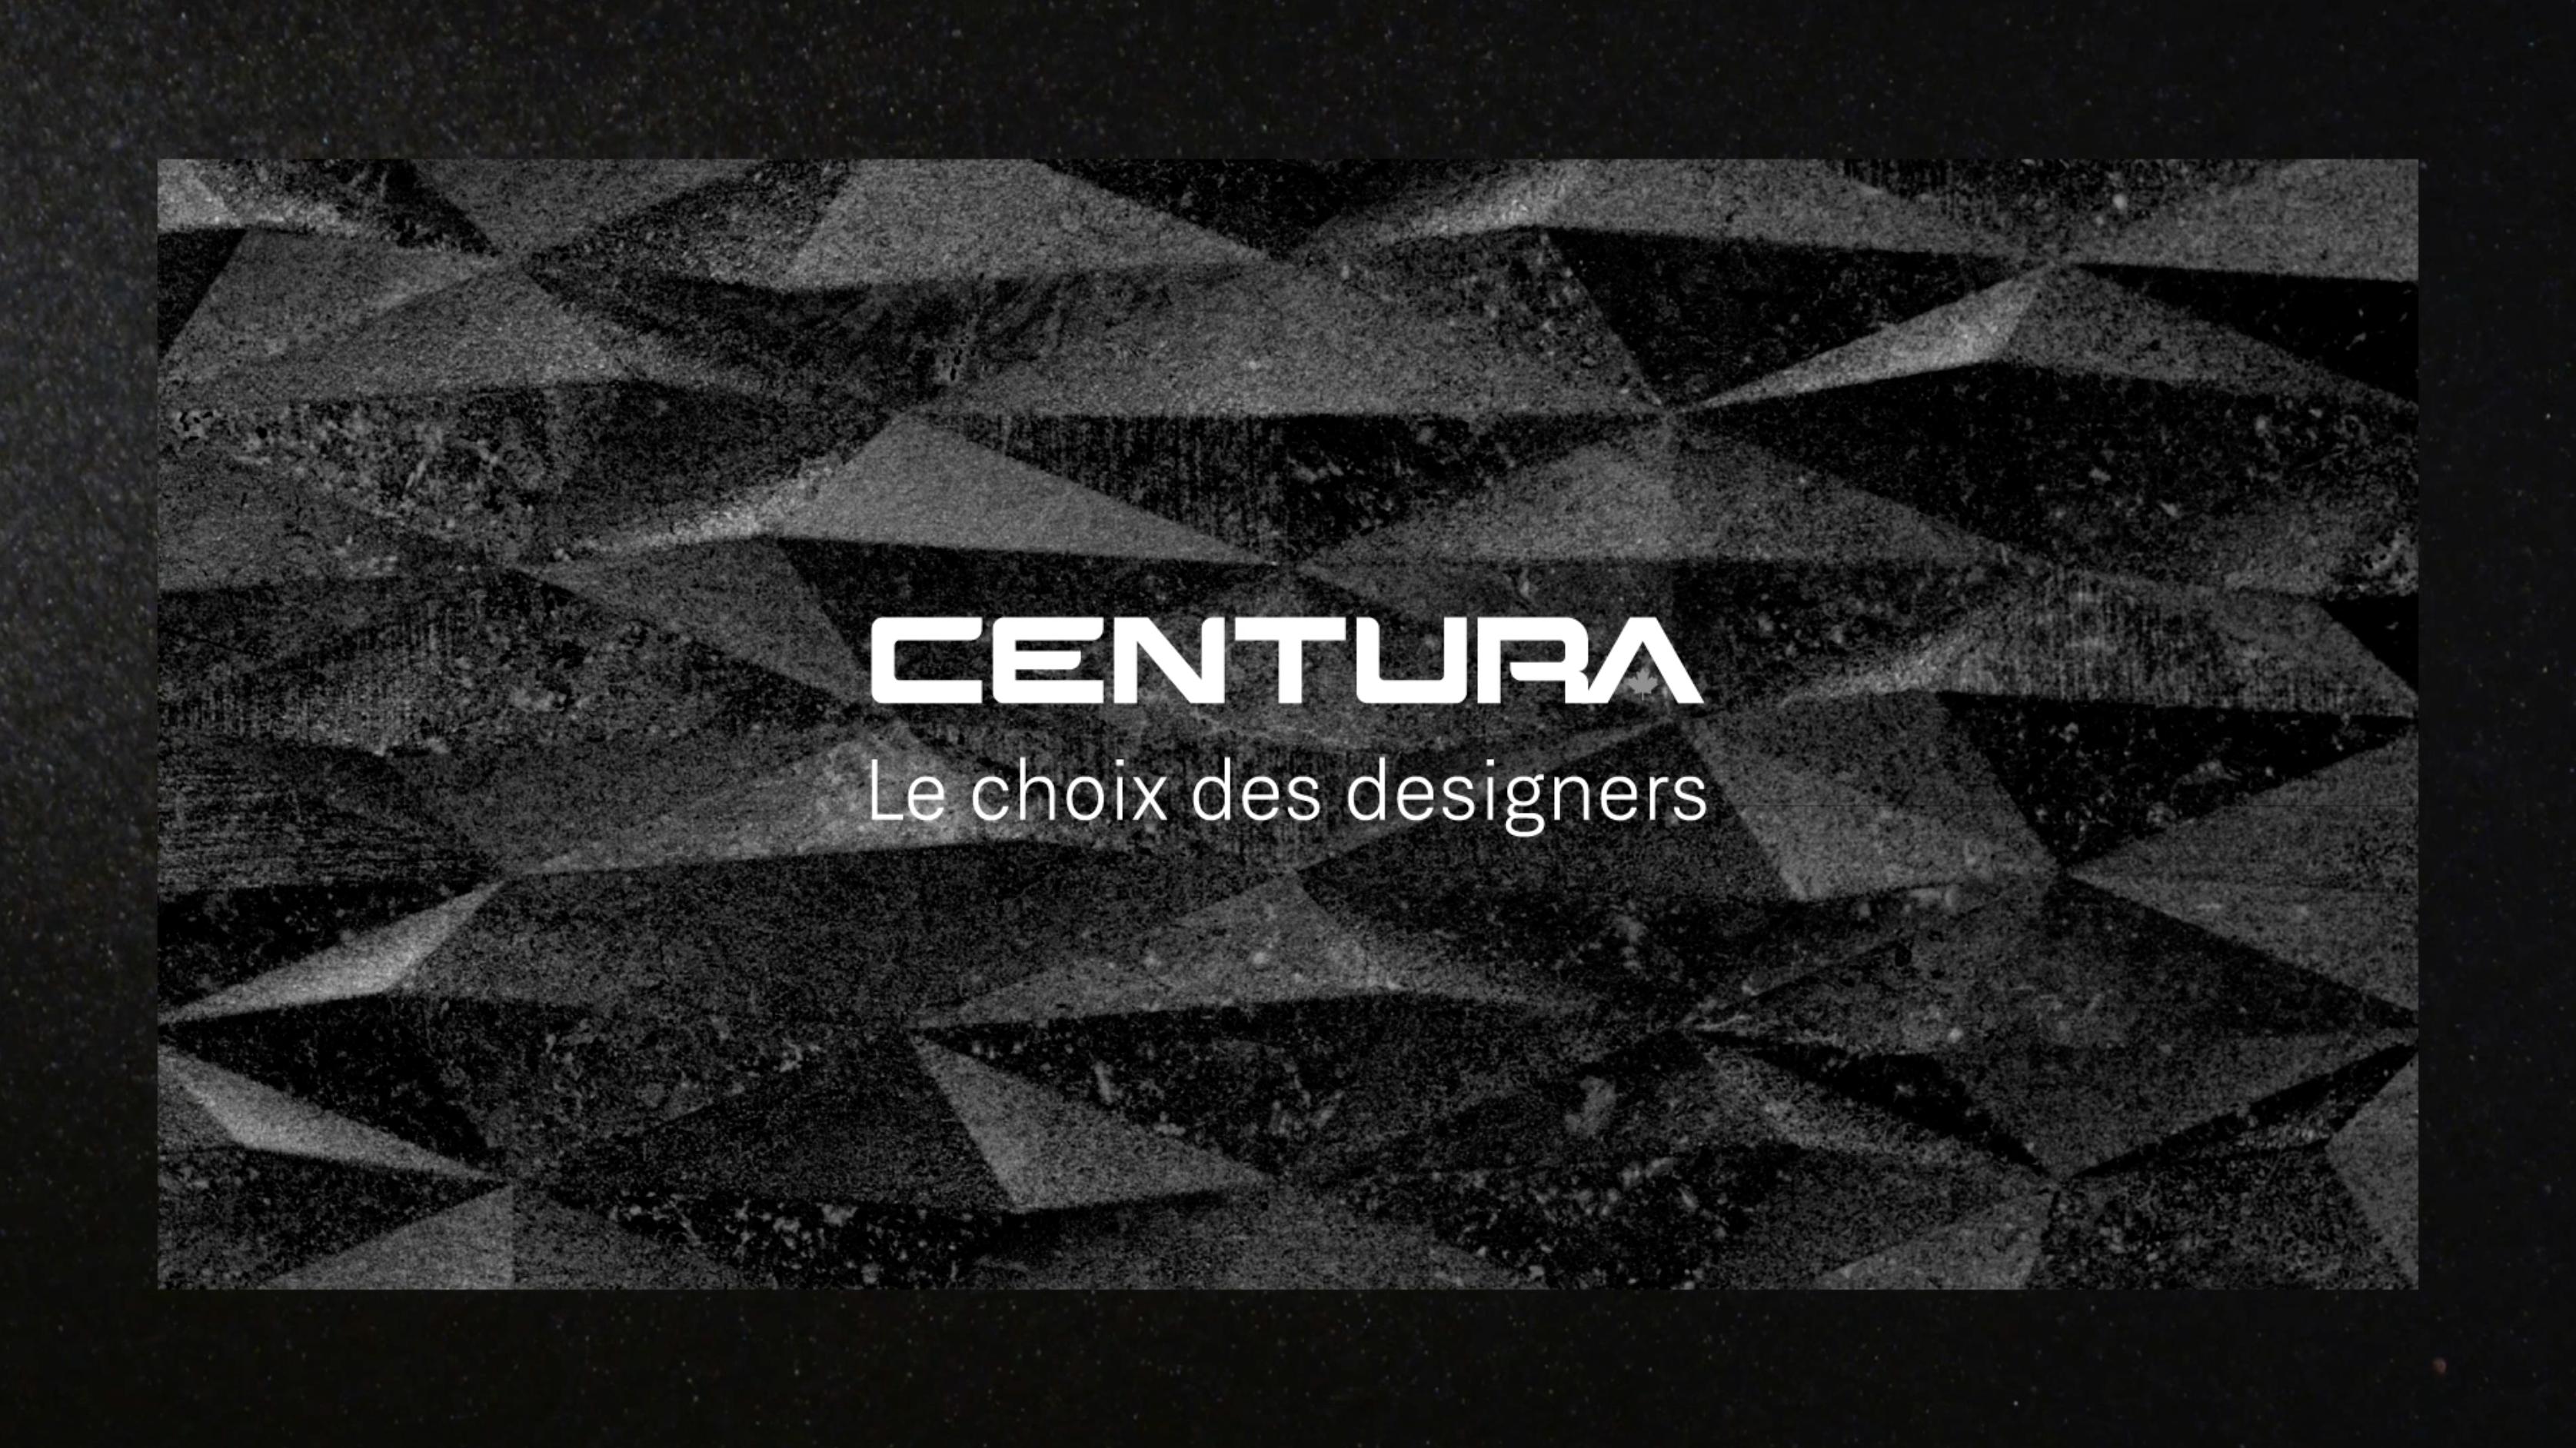 Centura